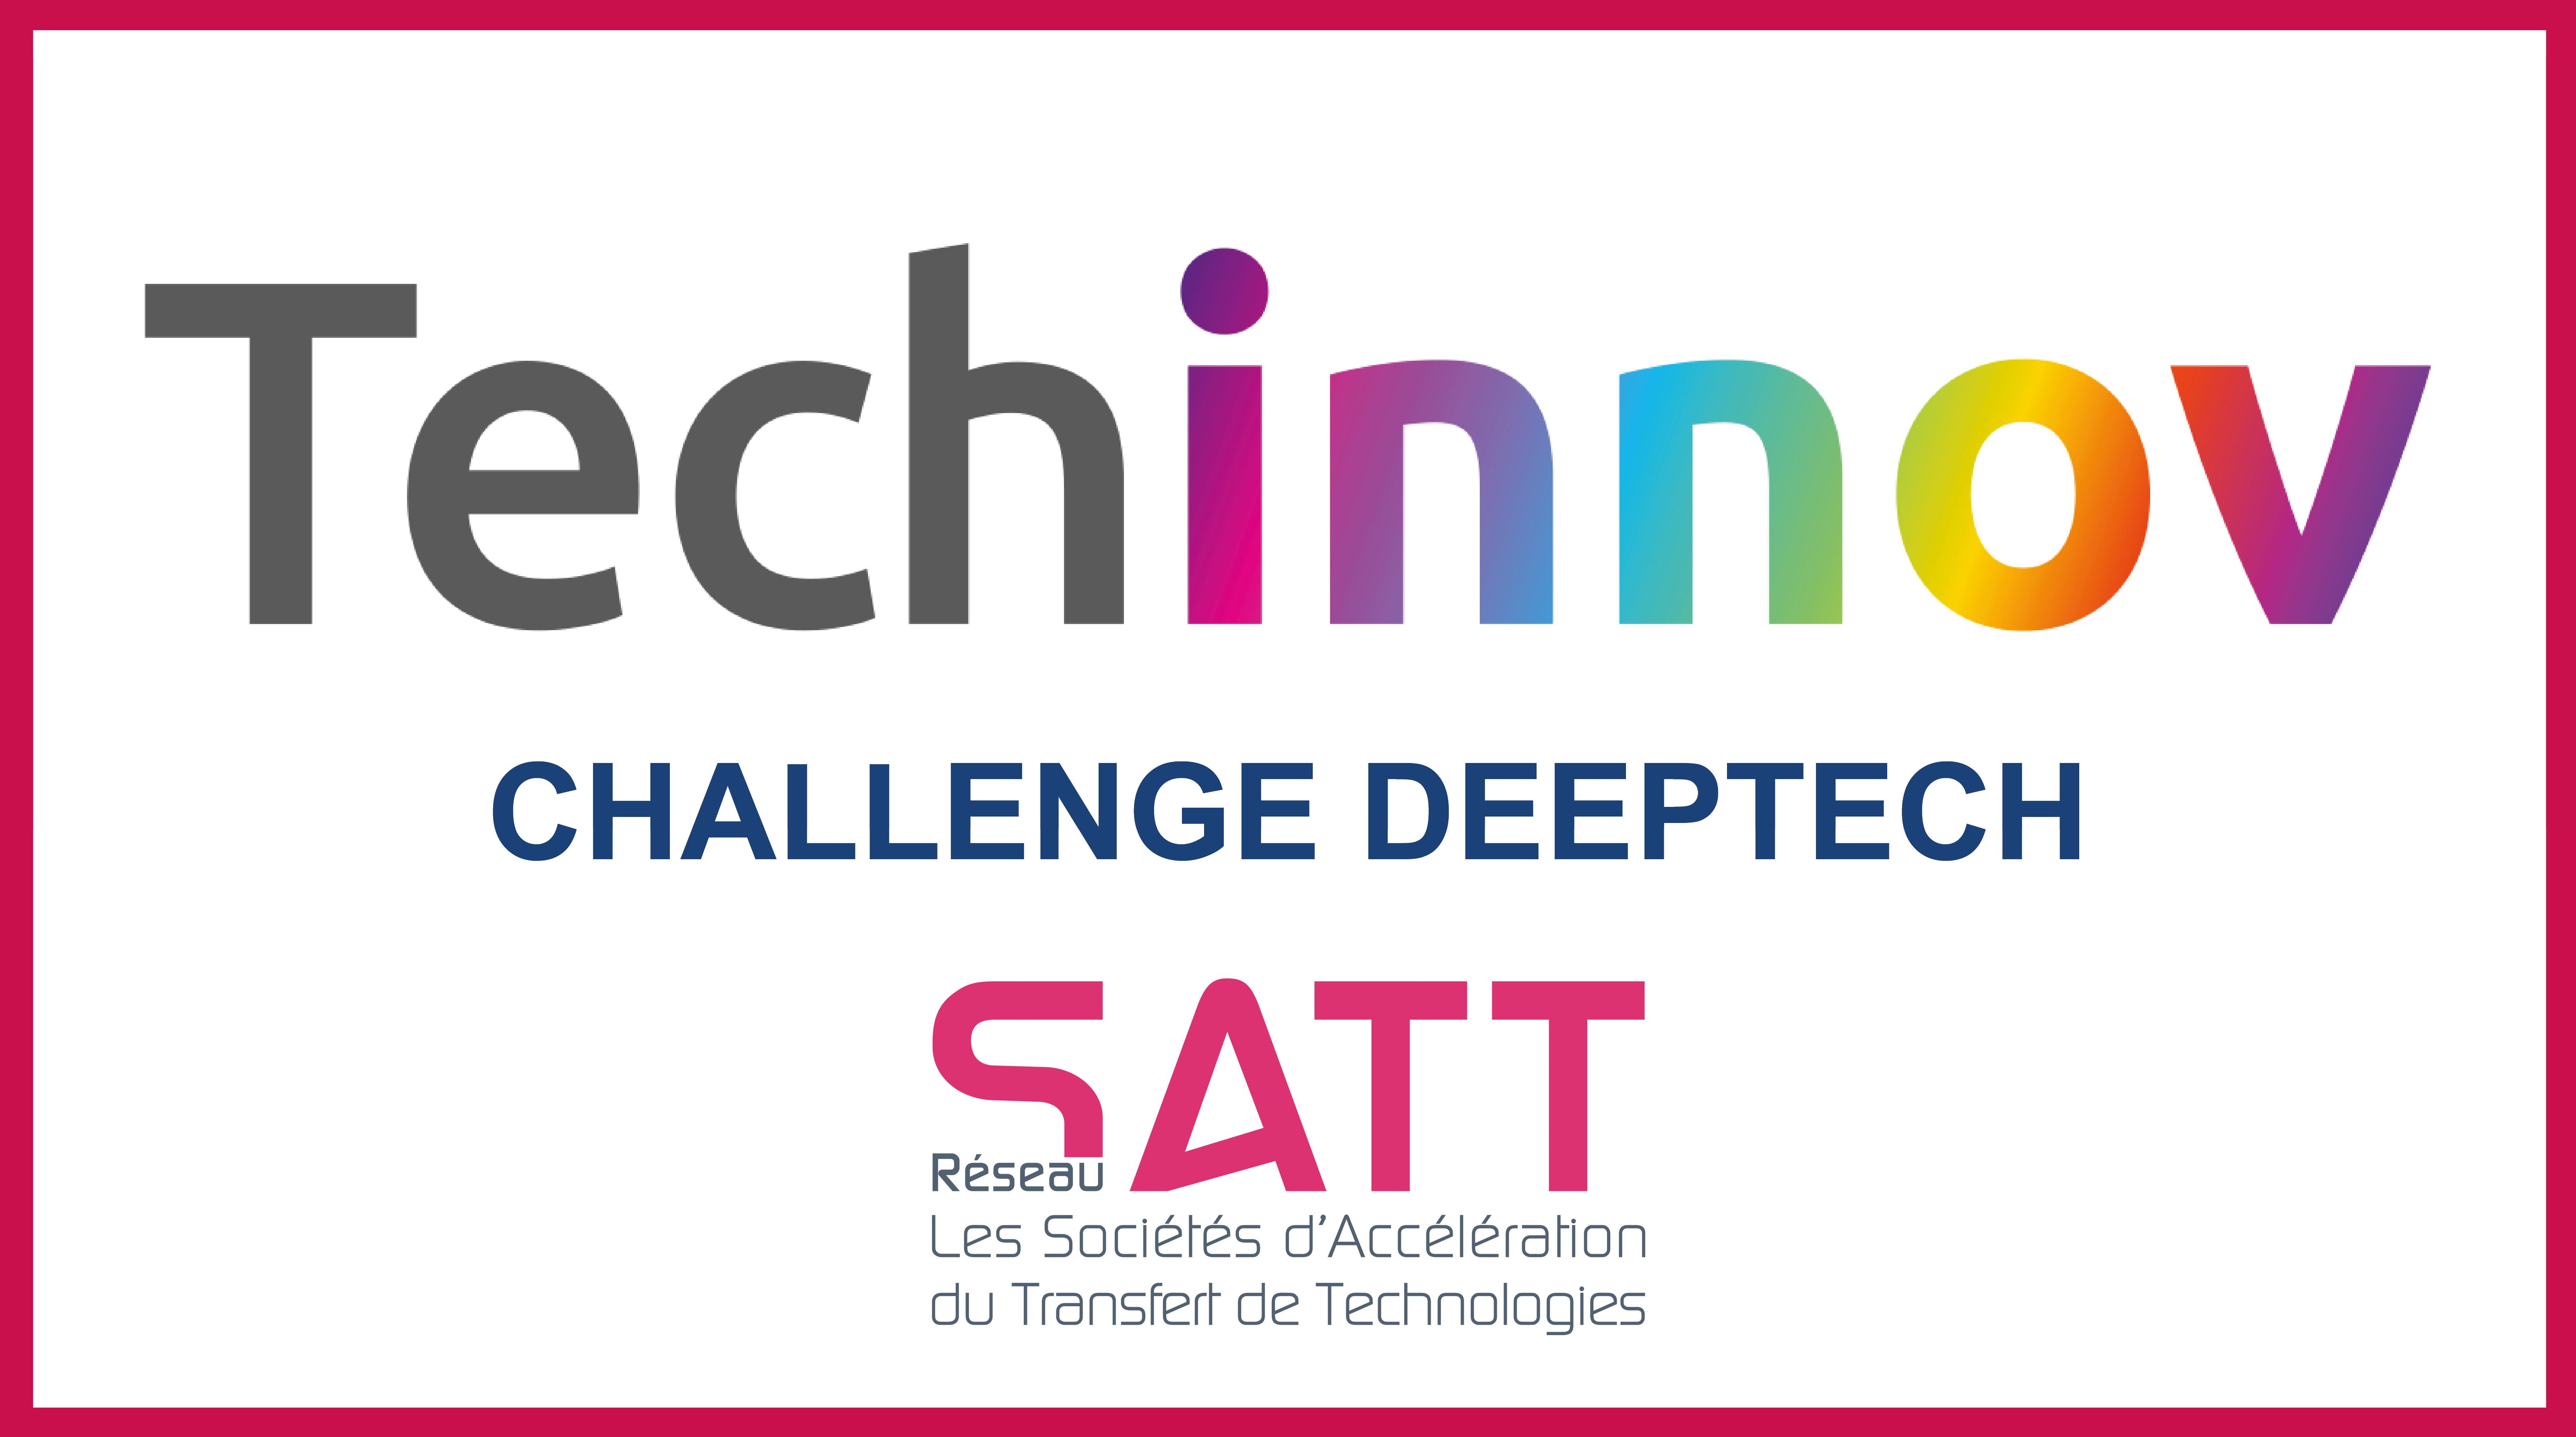 Techinnov Deeptech Challenge